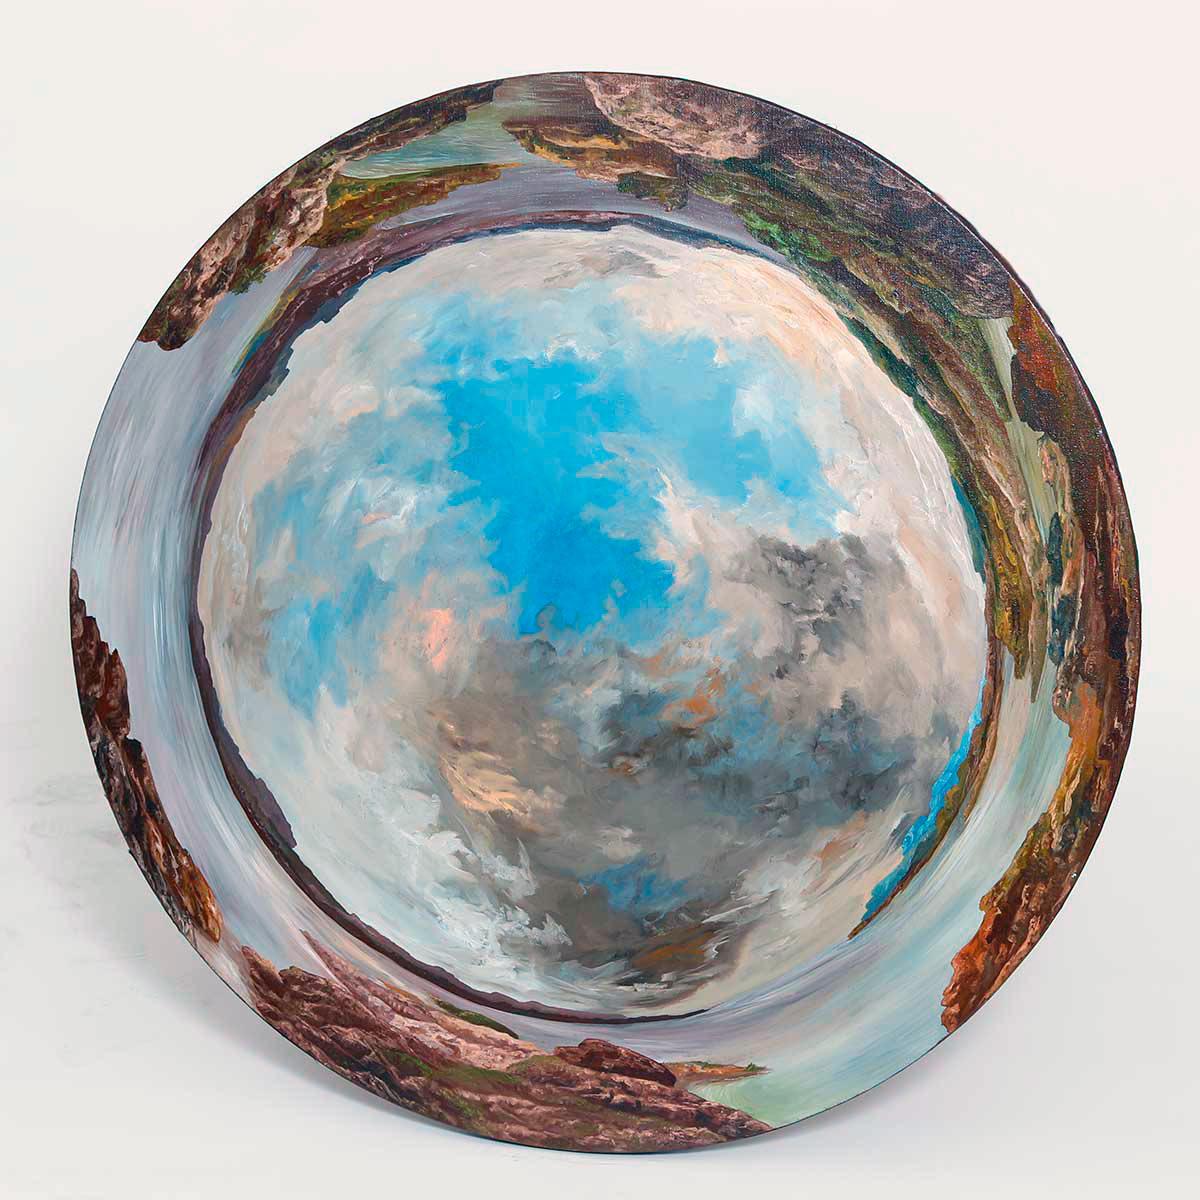 Galerie Insighter Paris by Vanessa Metayer presents Marc Aghemio